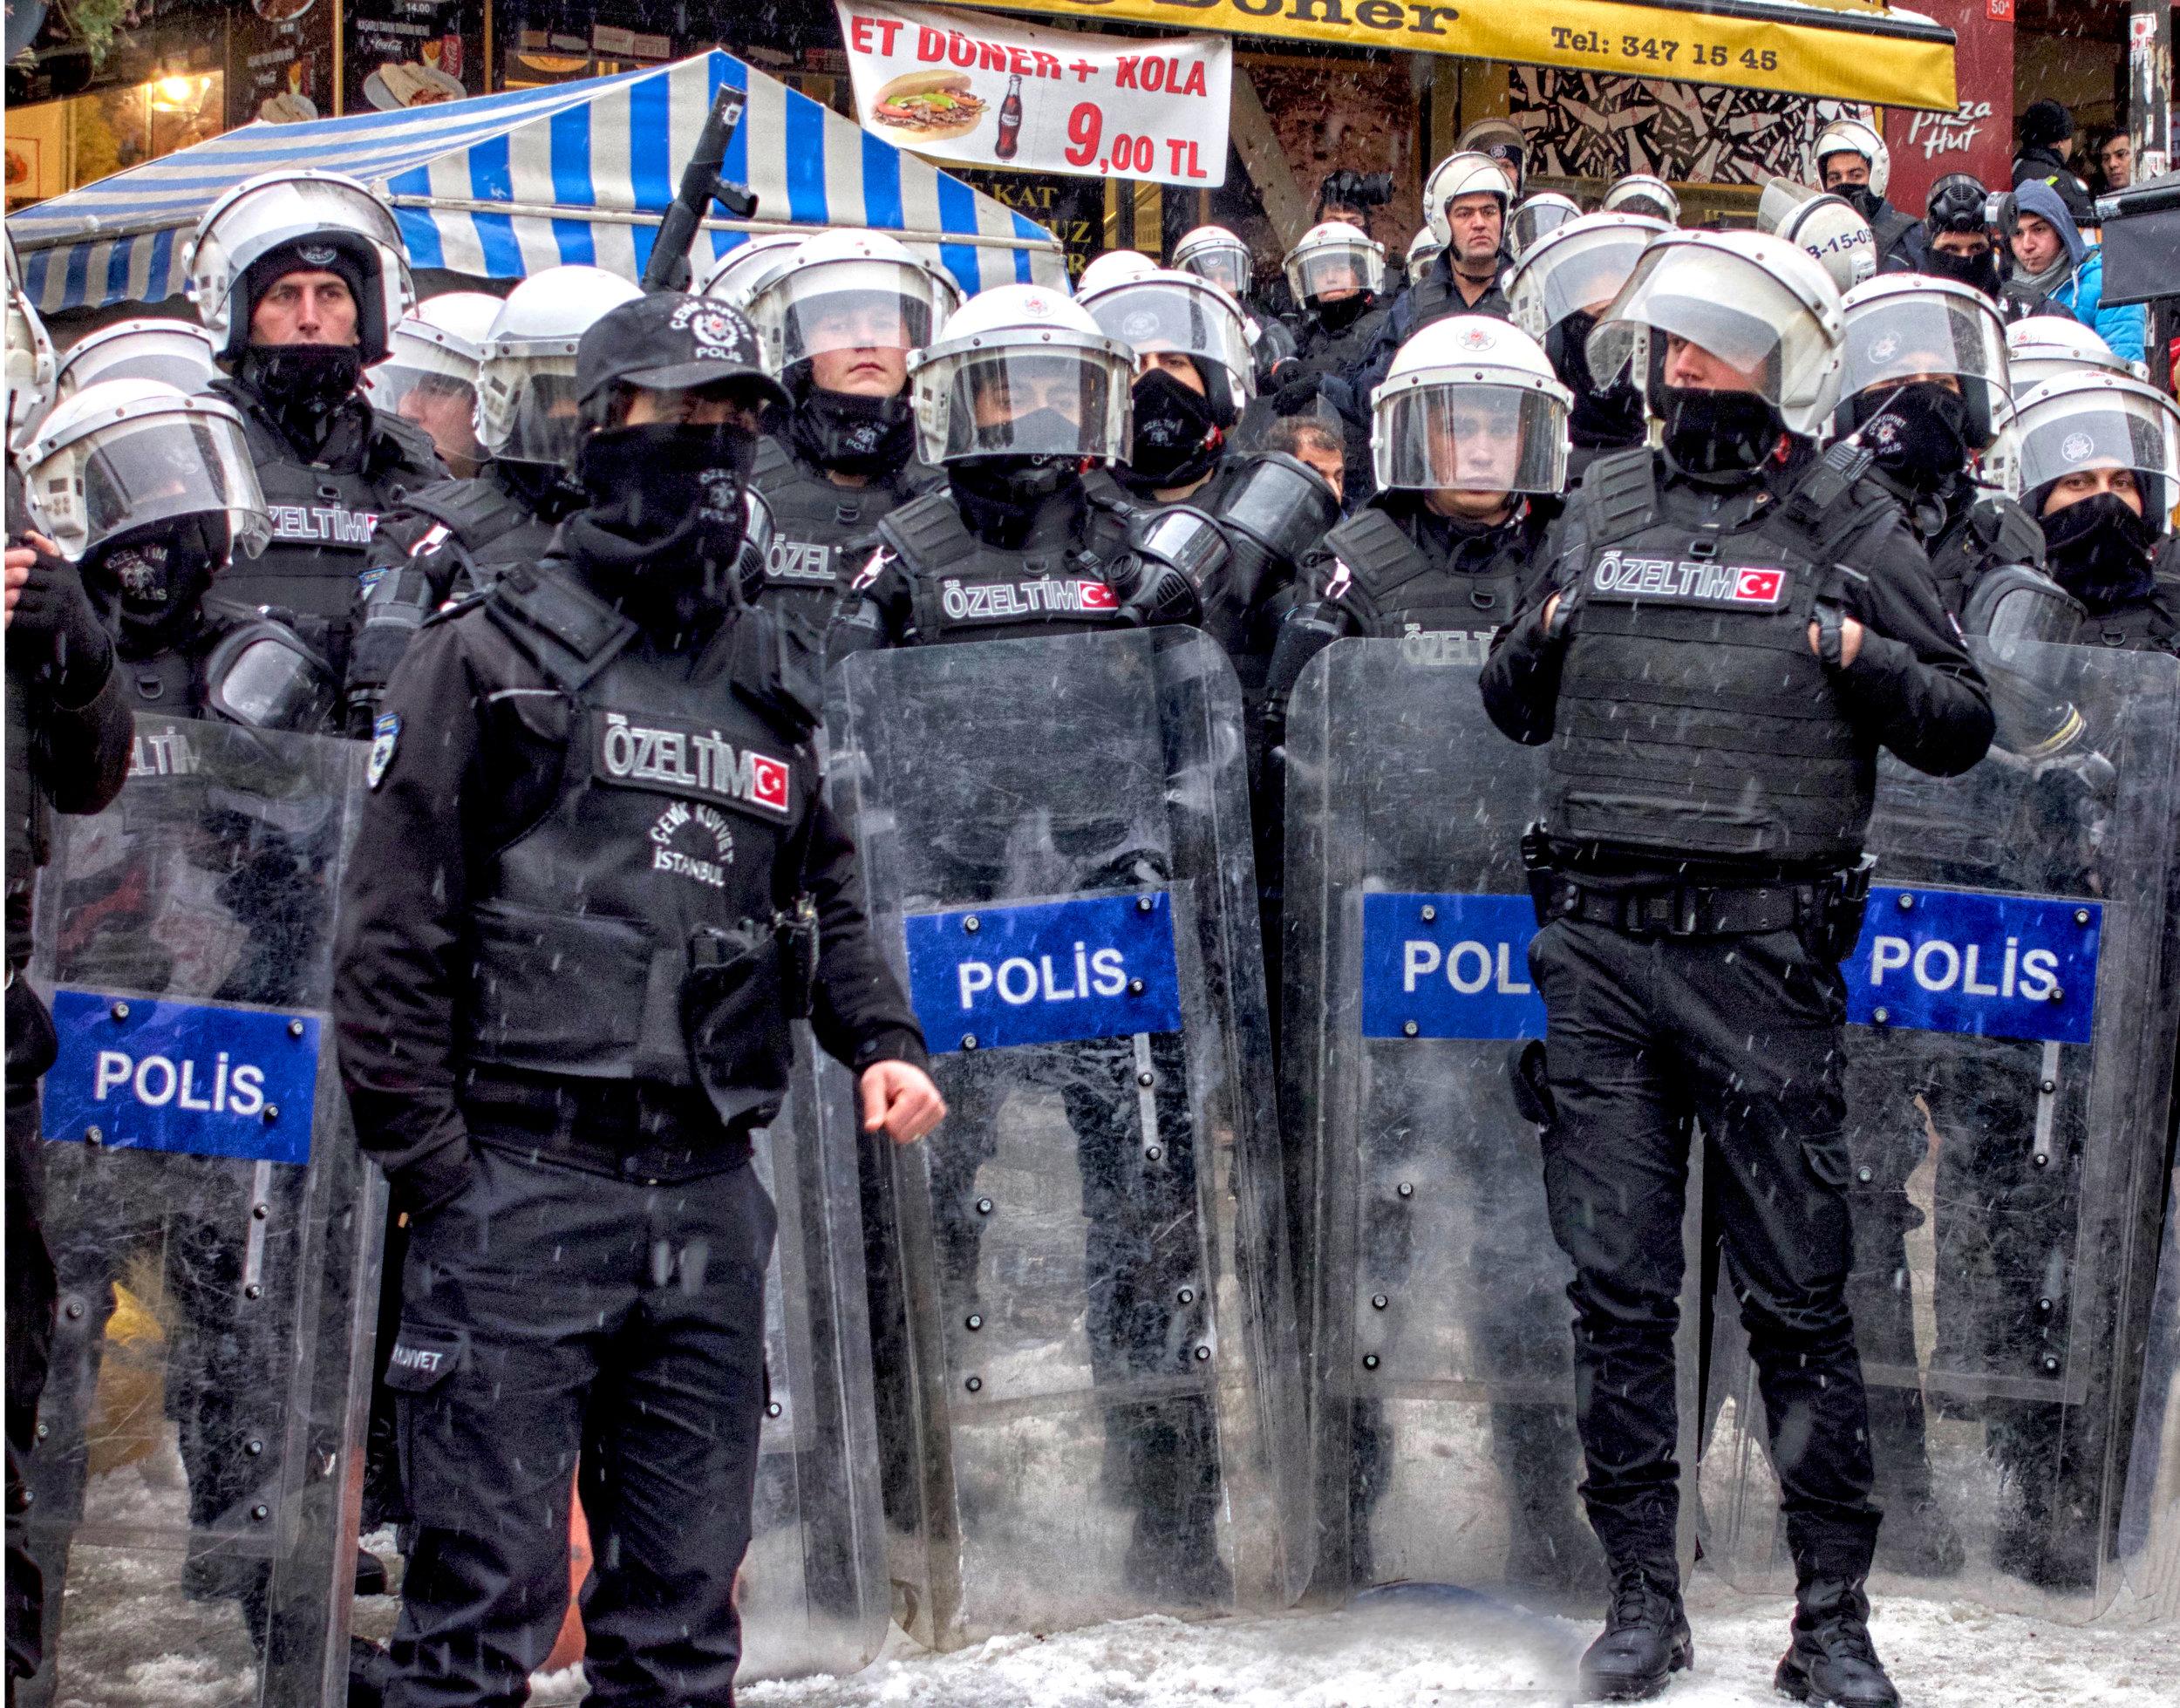 Polis, Istanbul